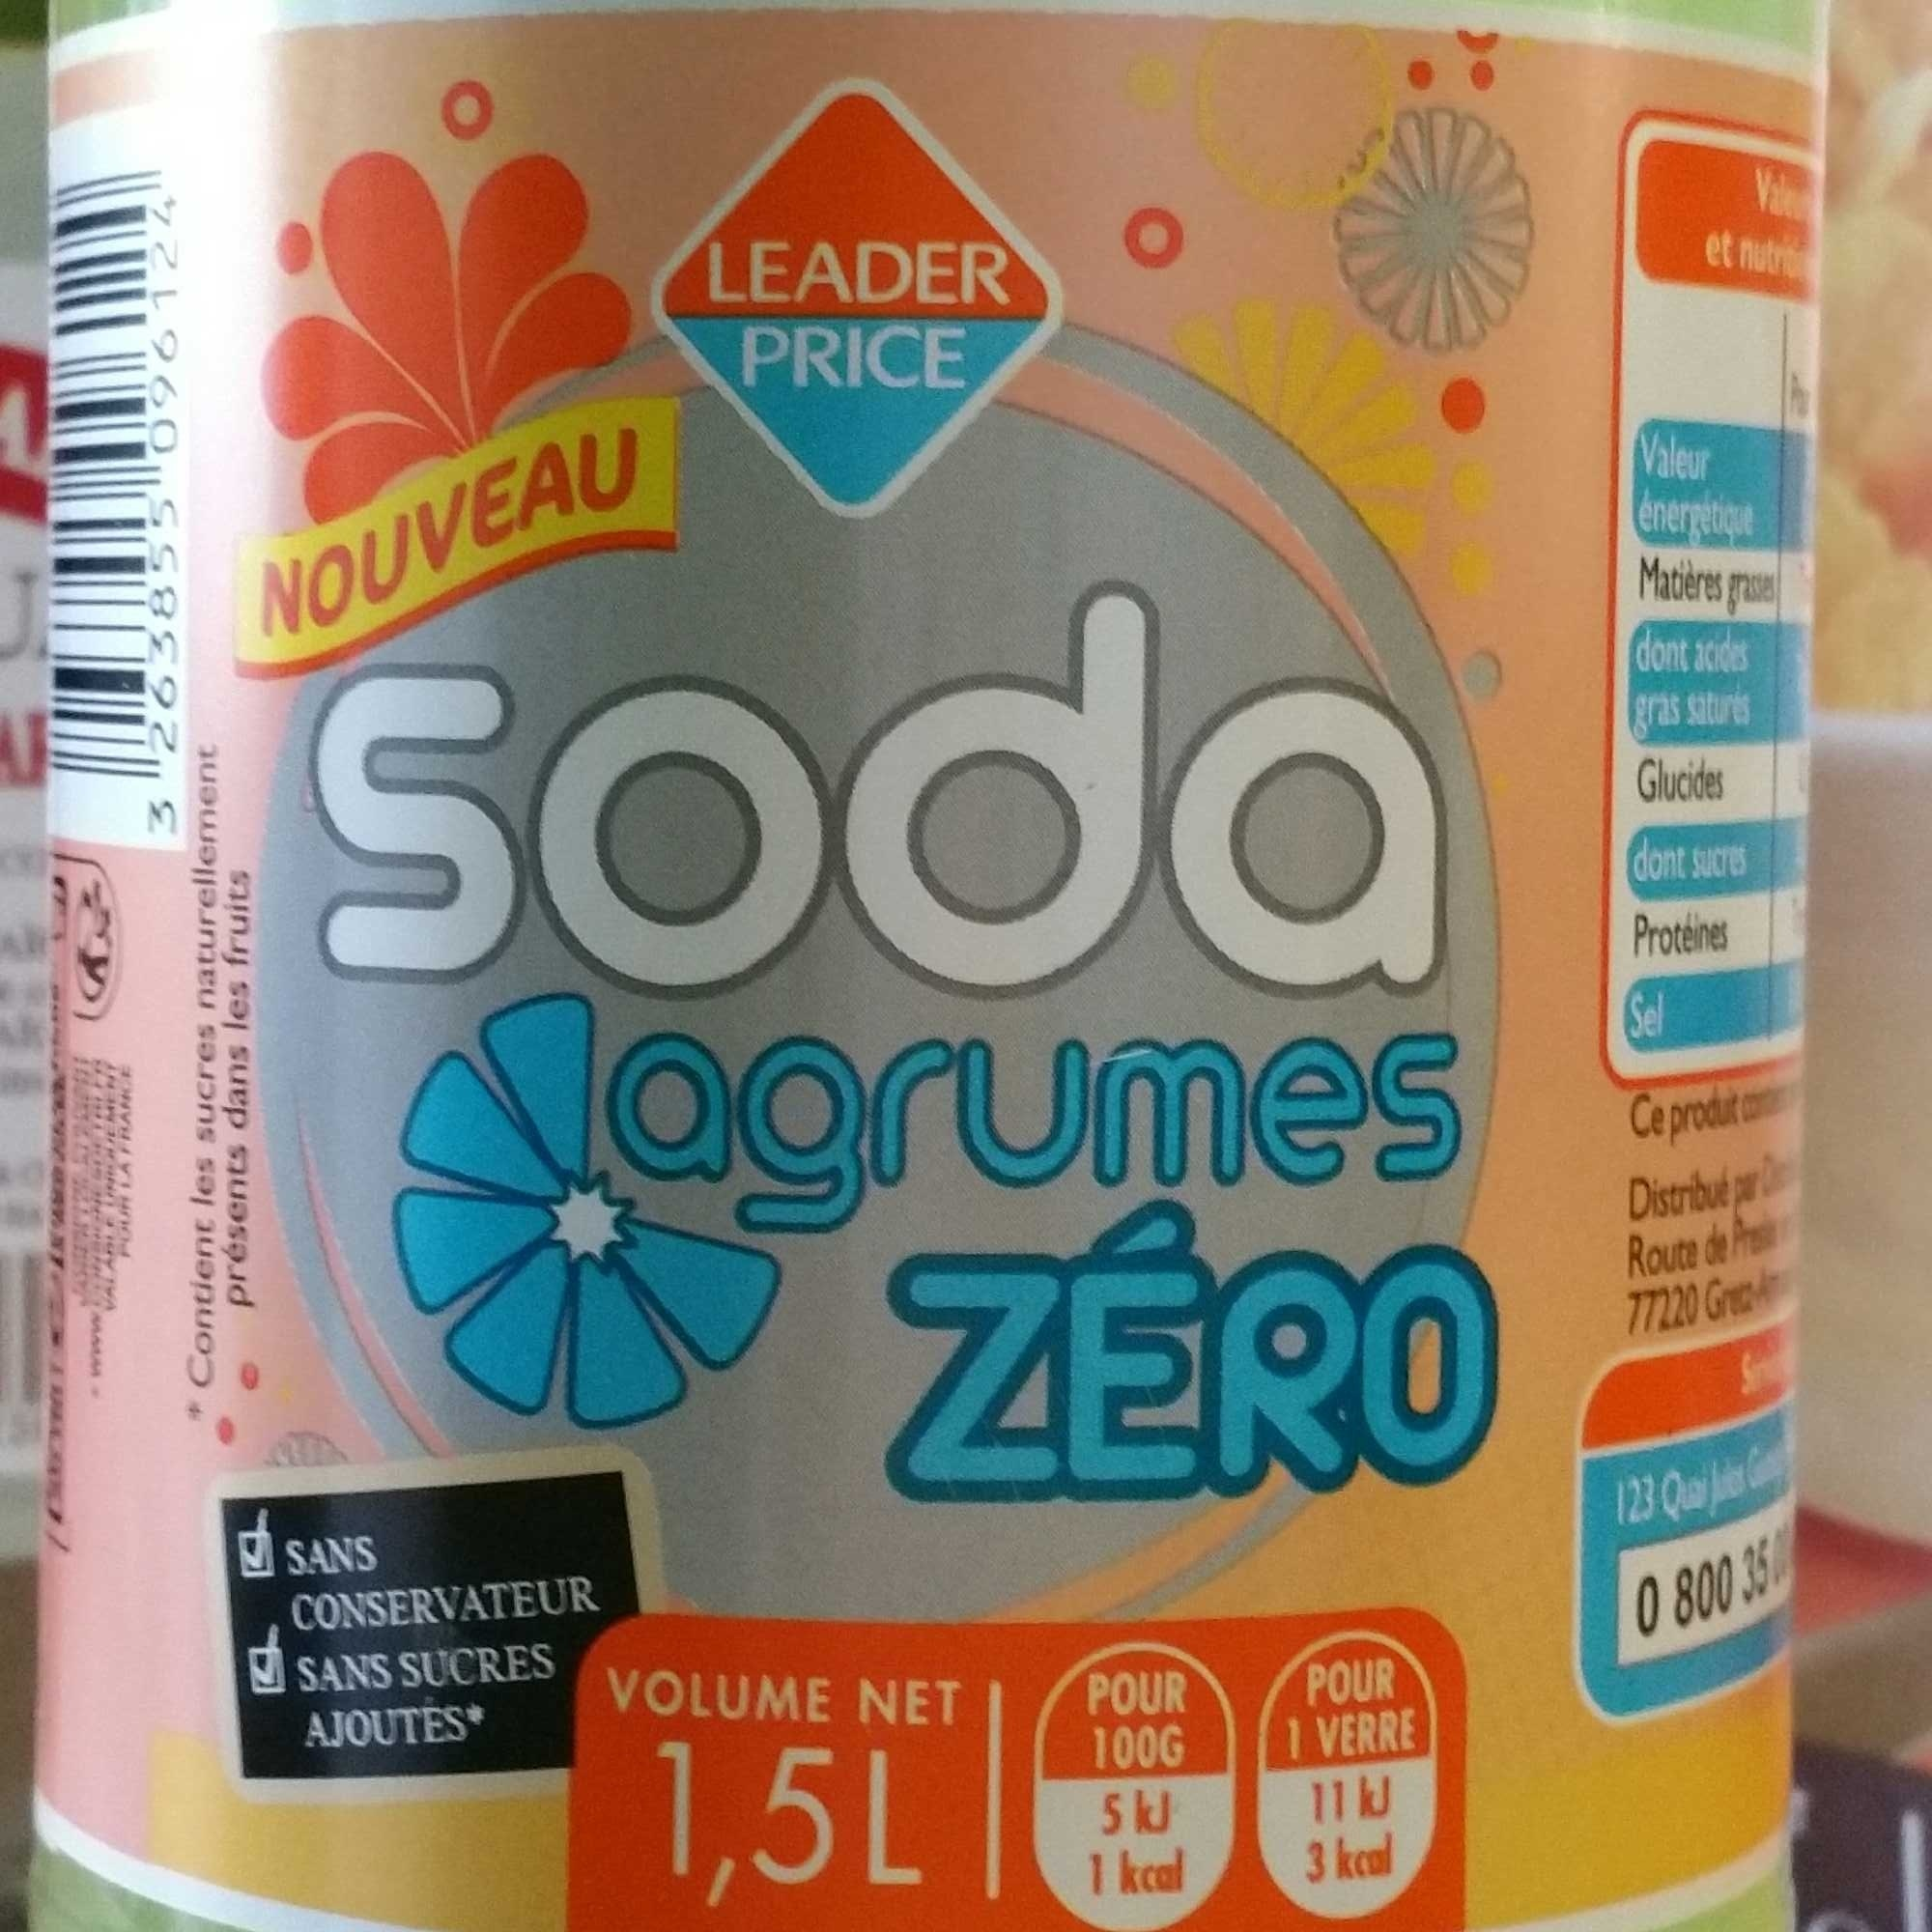 Soda agrumes zéro - Produit - fr